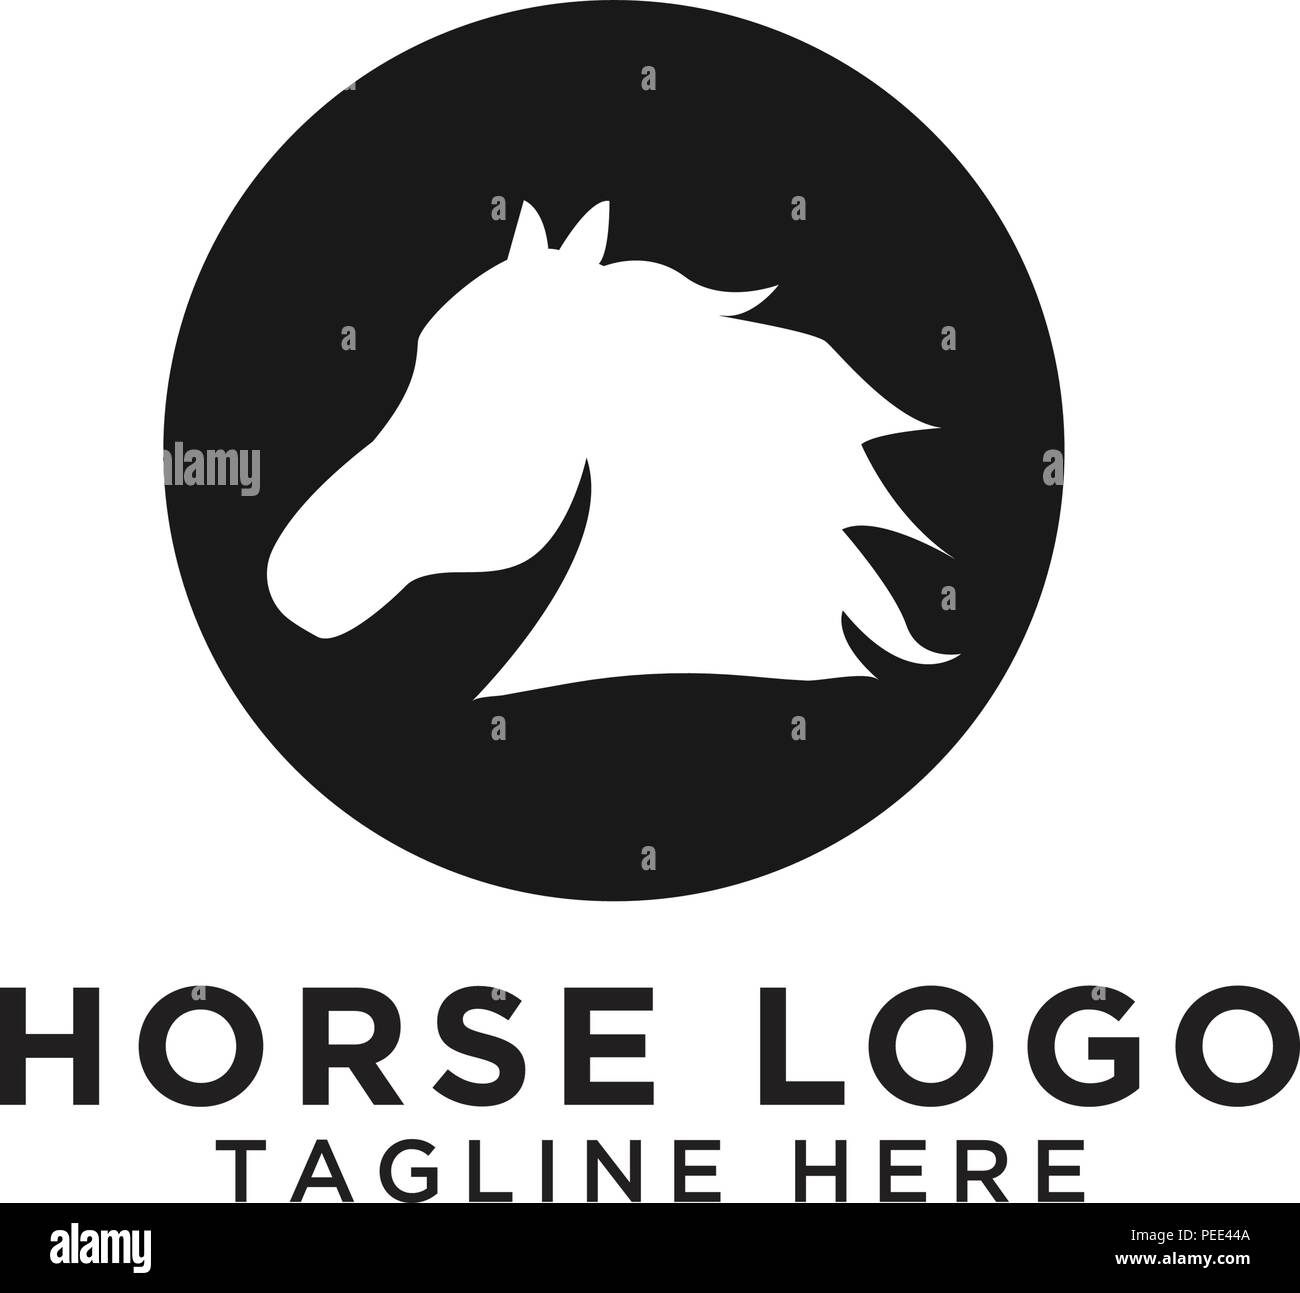 Illustration Of Circle Horse Silhouette Logo Design Template Vector Stock Vector Image Art Alamy